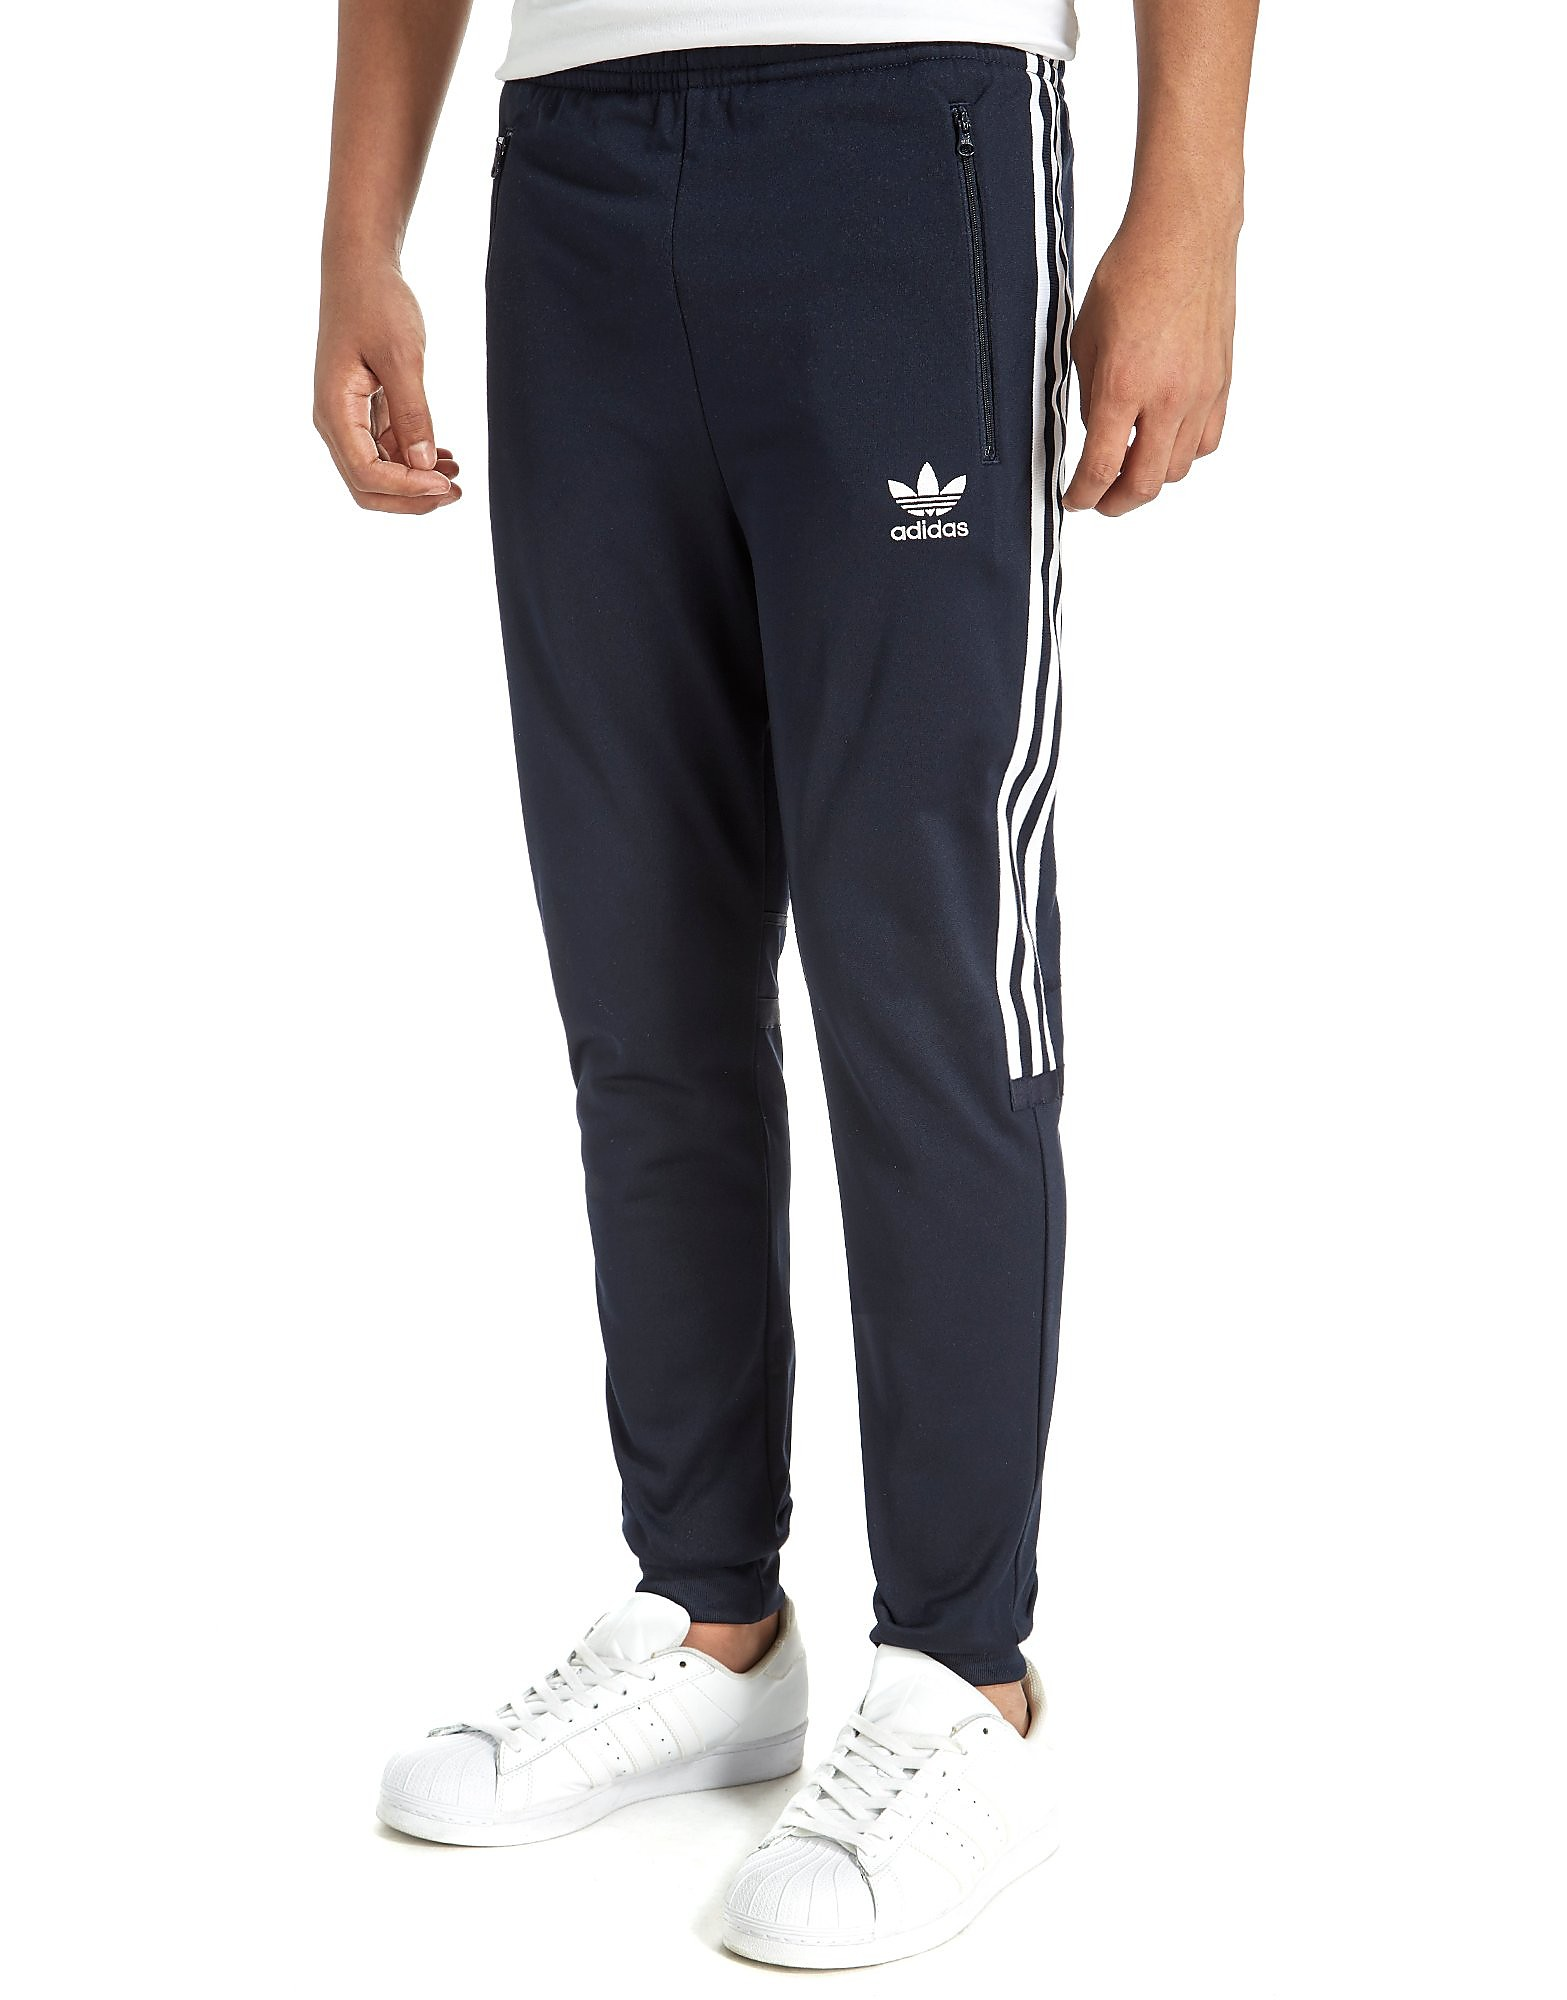 adidas Originals Challenger pantalon junior